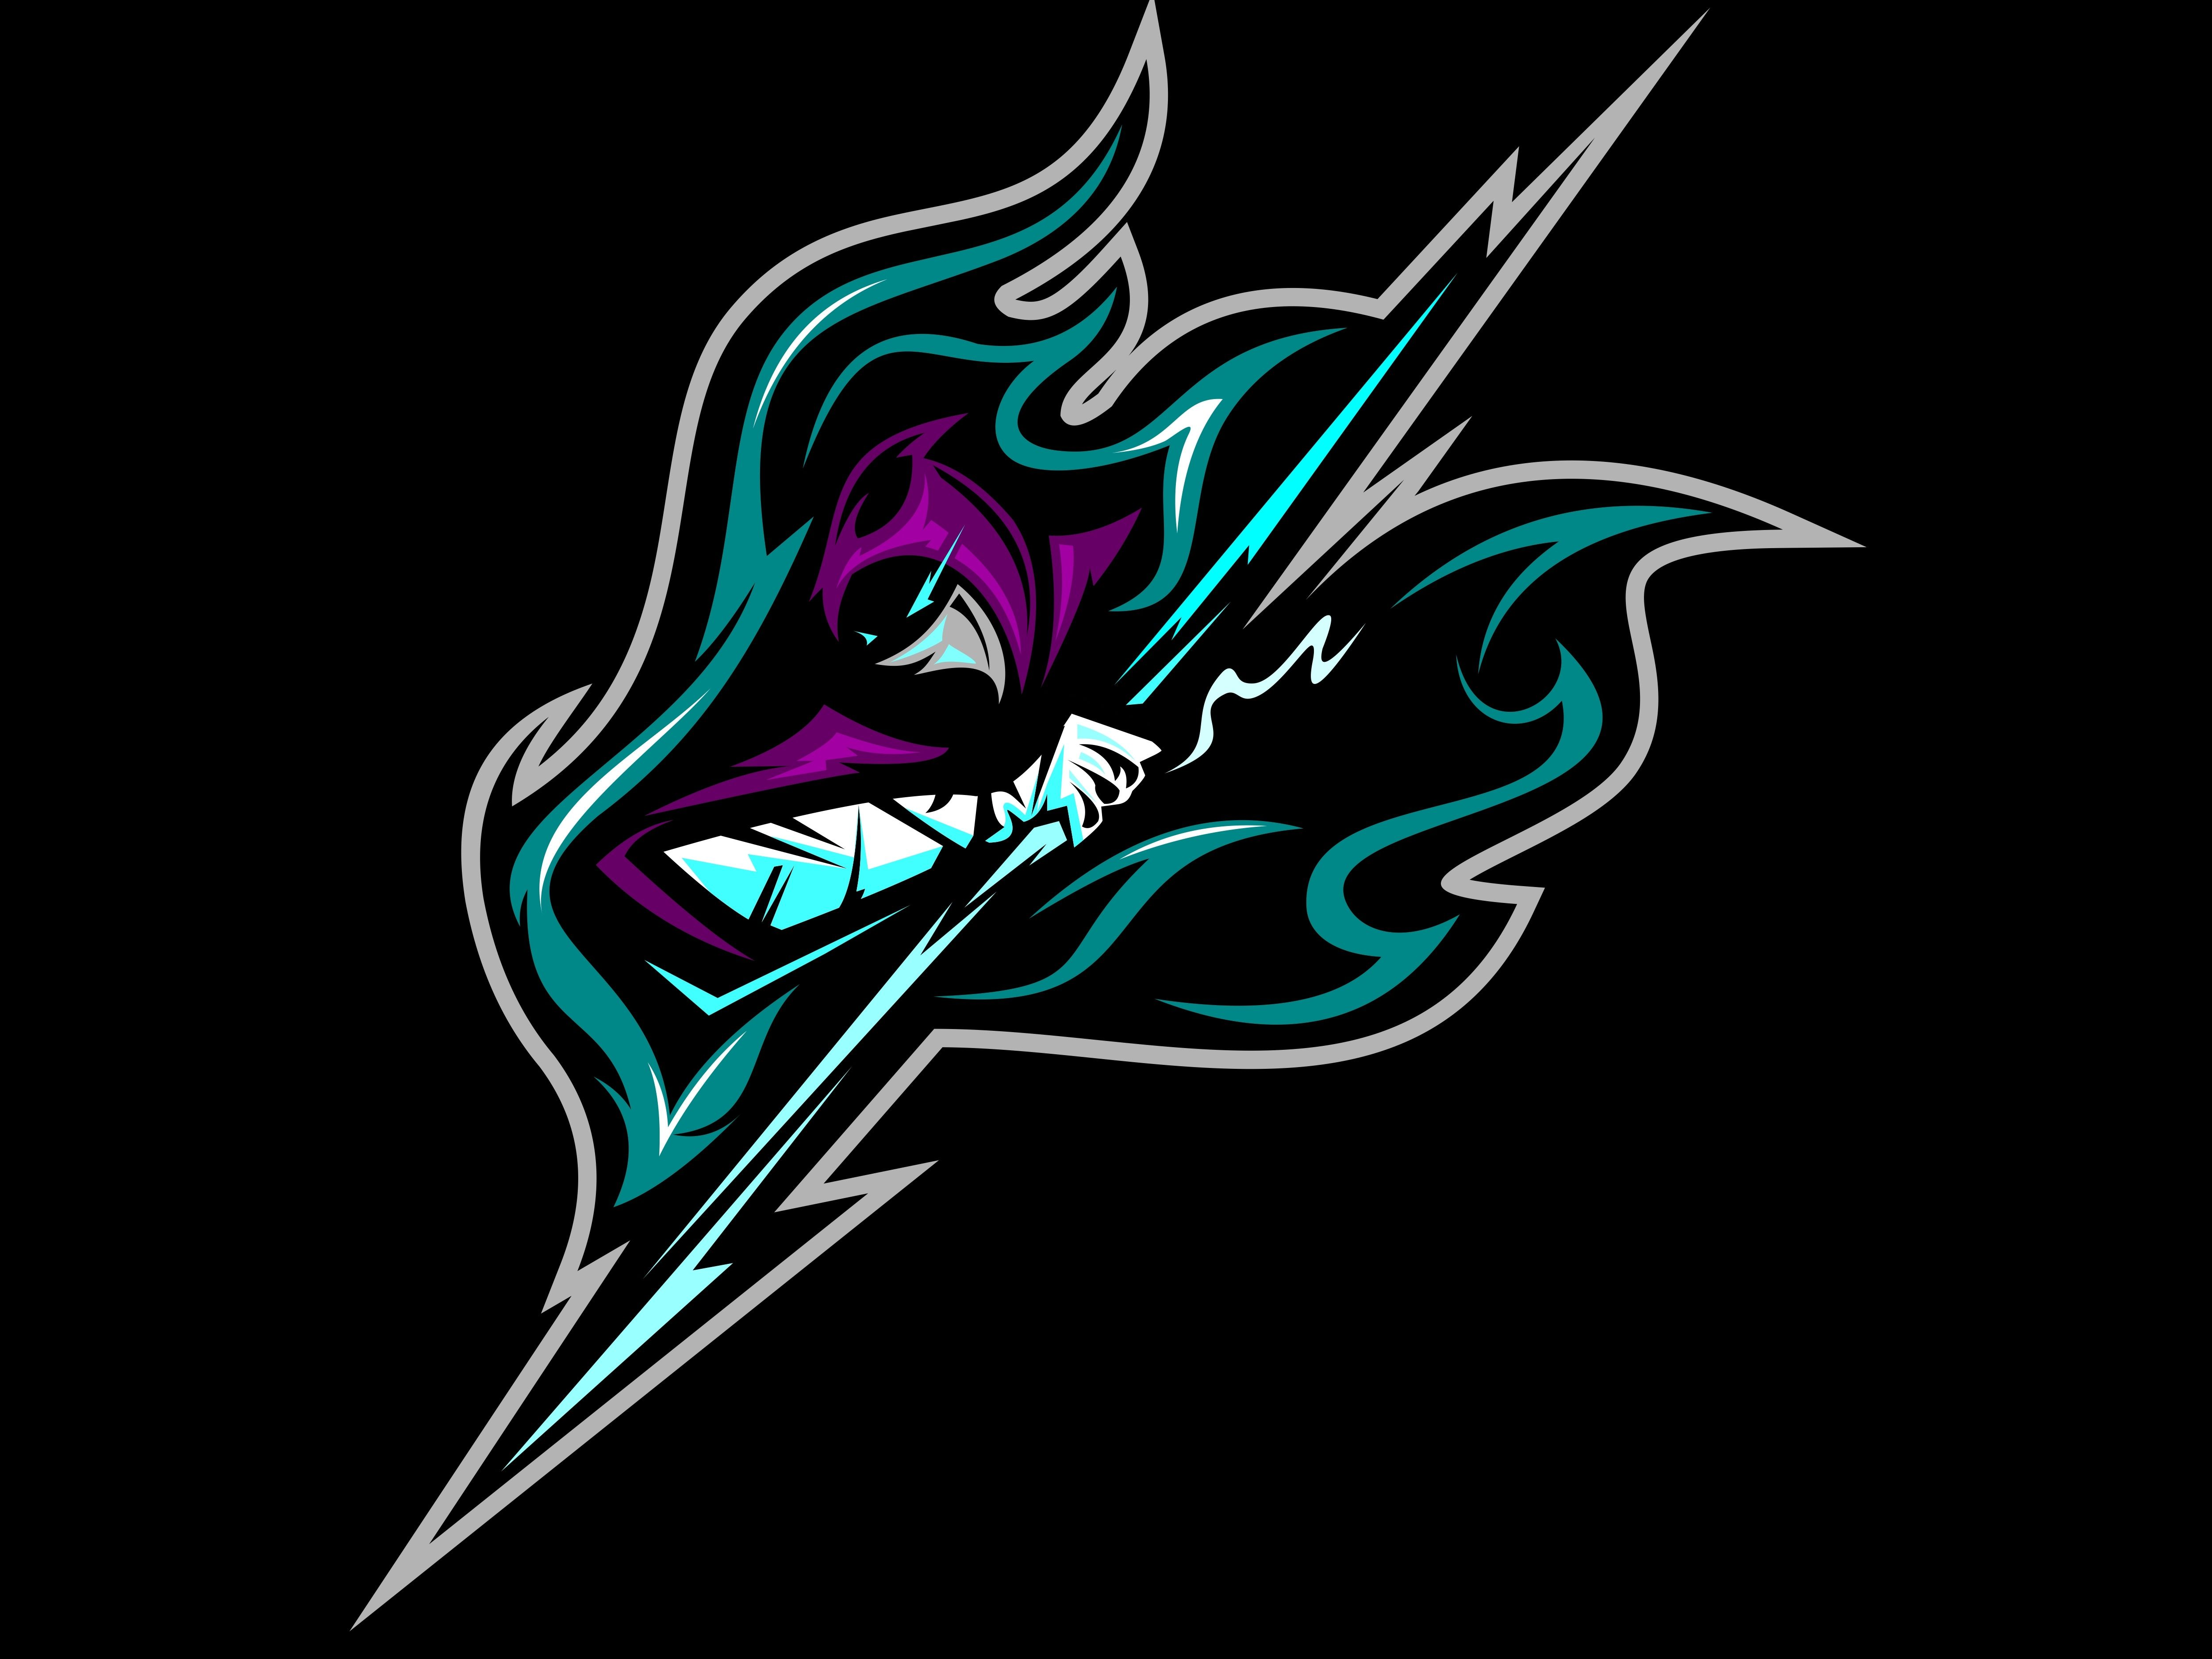 Ninja Thunder Game logo design, Game logo, Esports logo